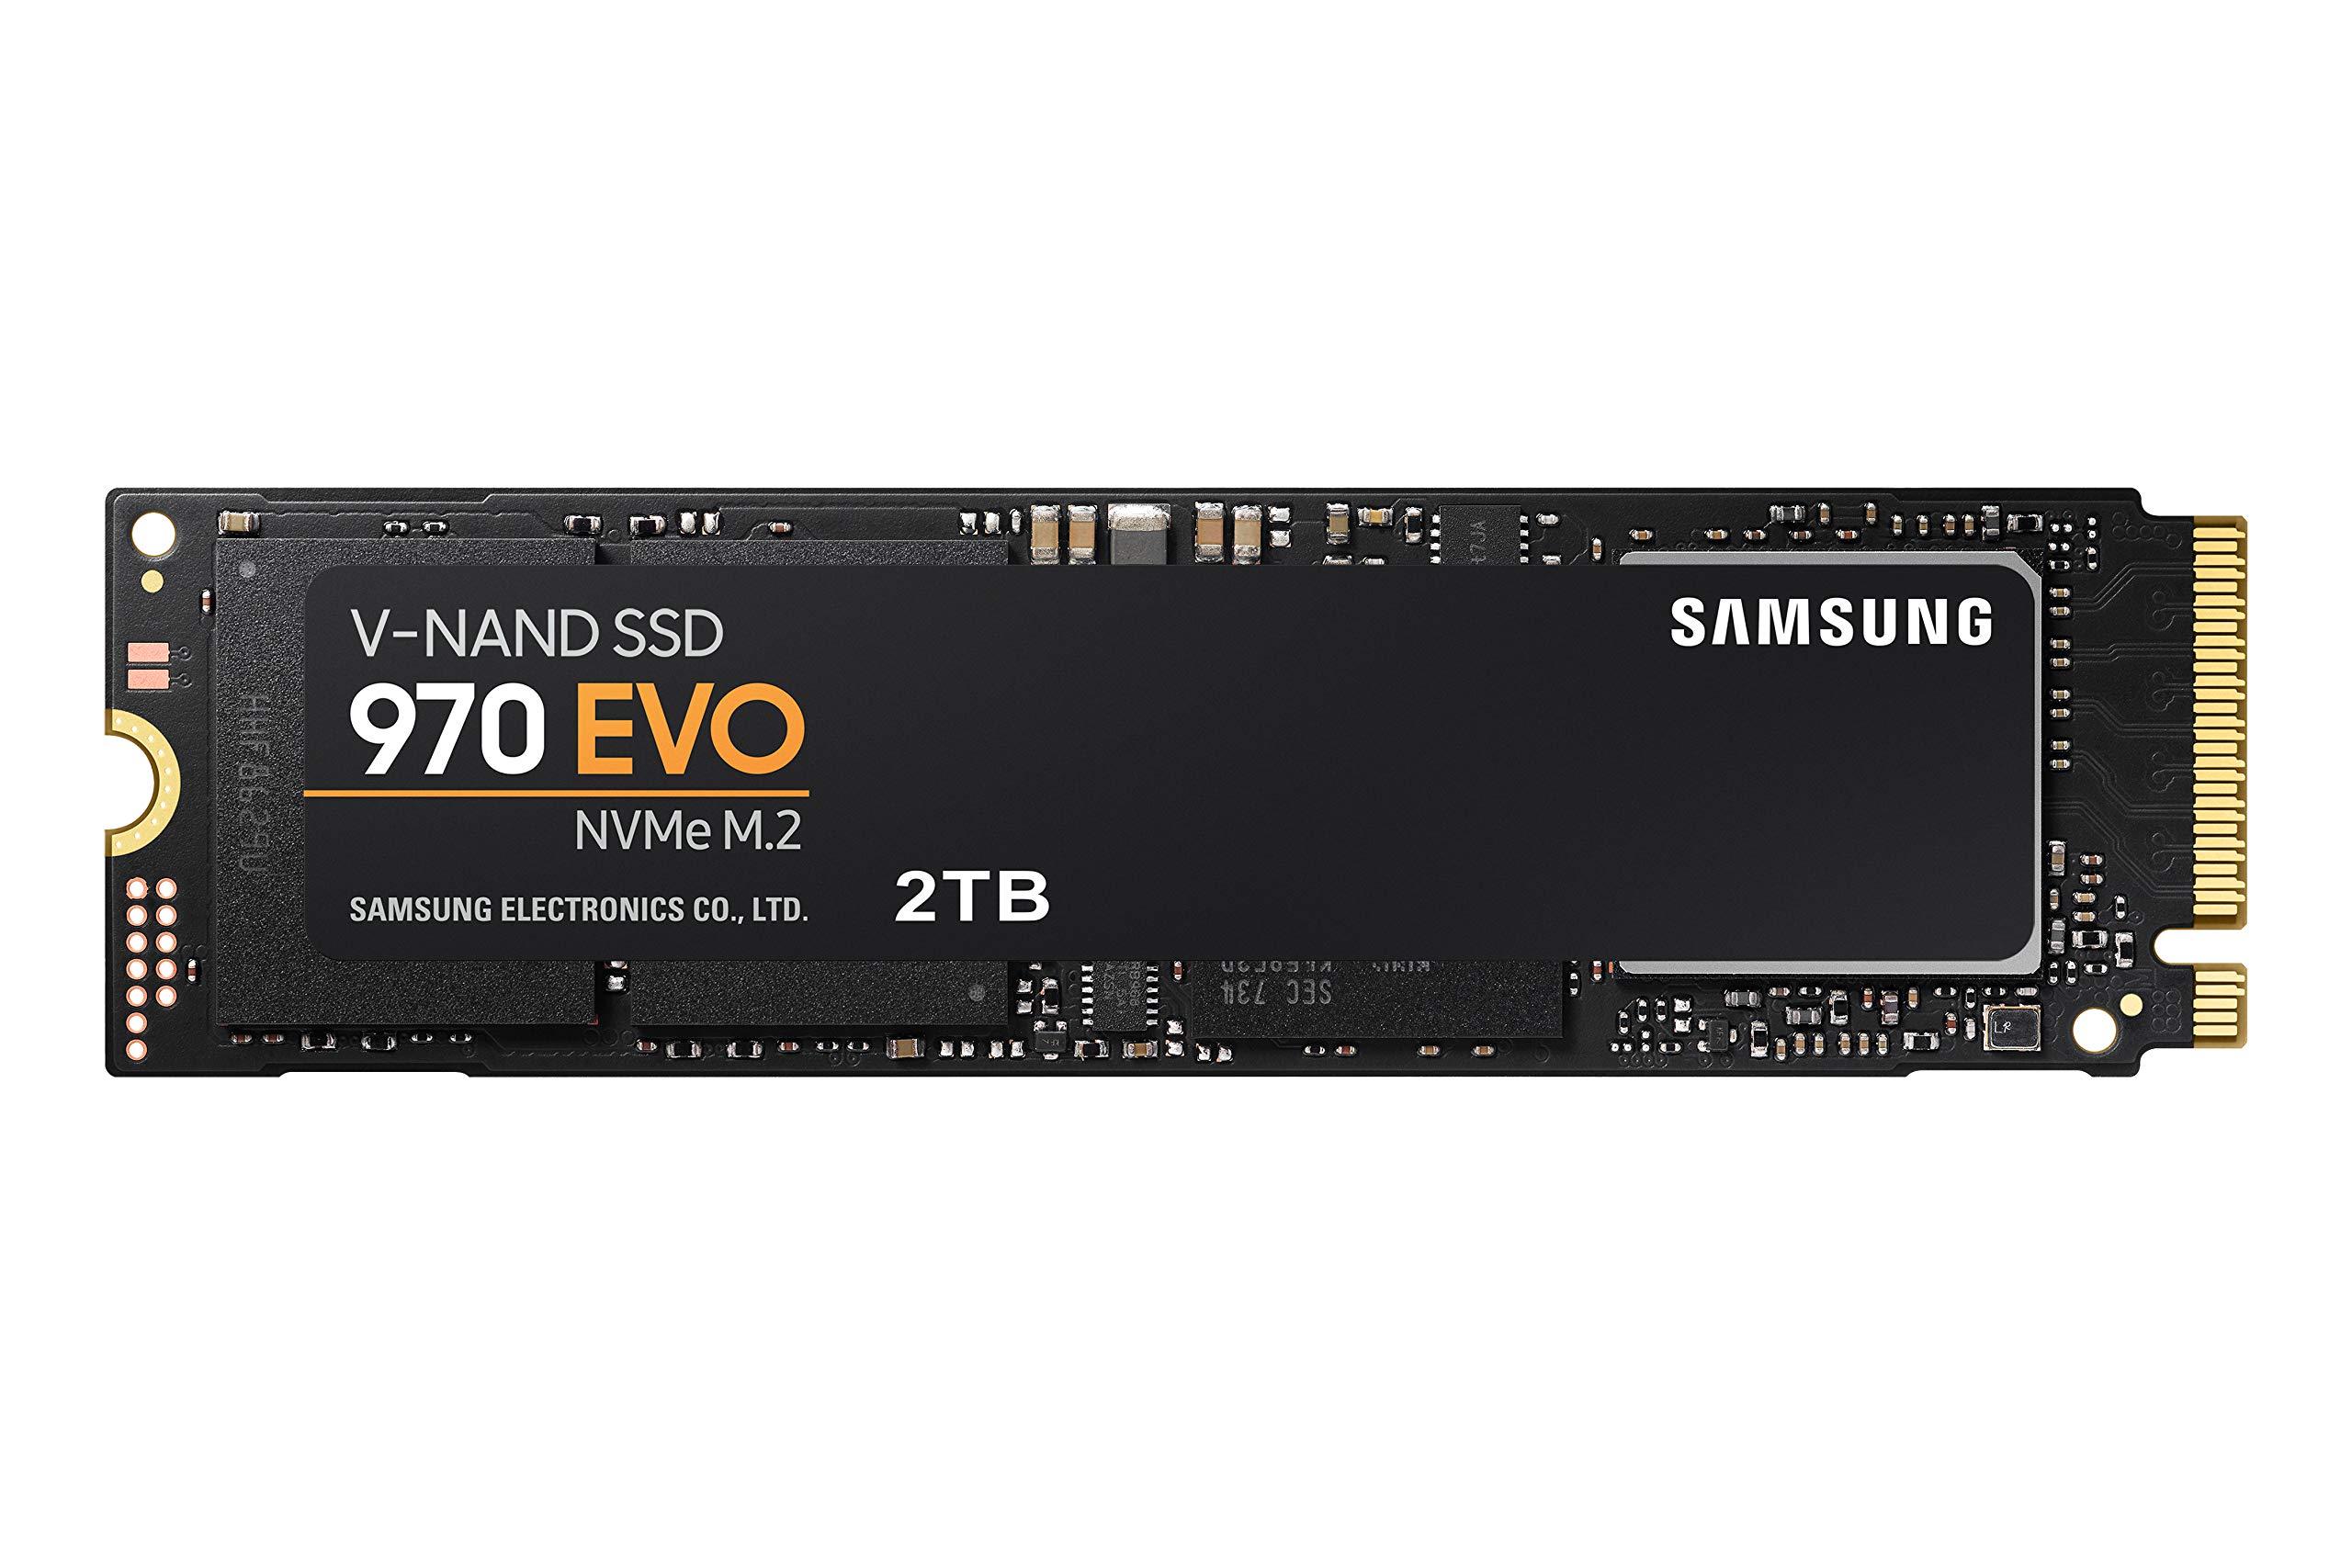 Samsung SSD 970 EVO 2TB - NVMe PCIe M.2 2280 SSD (MZ-V7E2T0BW) by Samsung (Image #1)